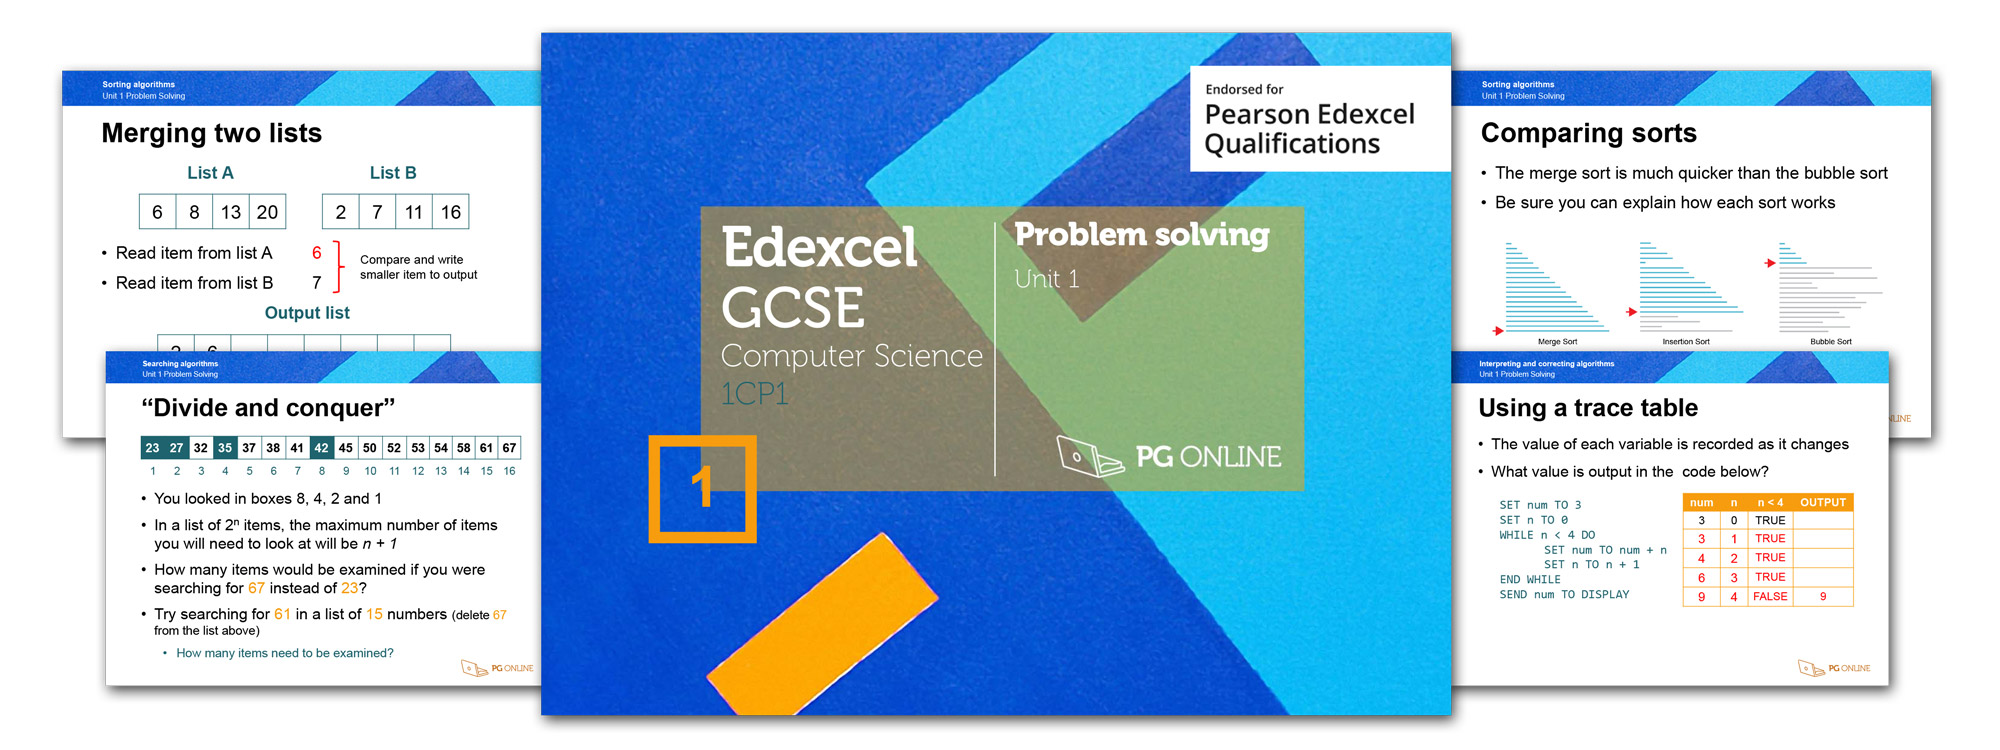 Resources > Computer Science > Gcse Edexcel > Edexcel 1cp1